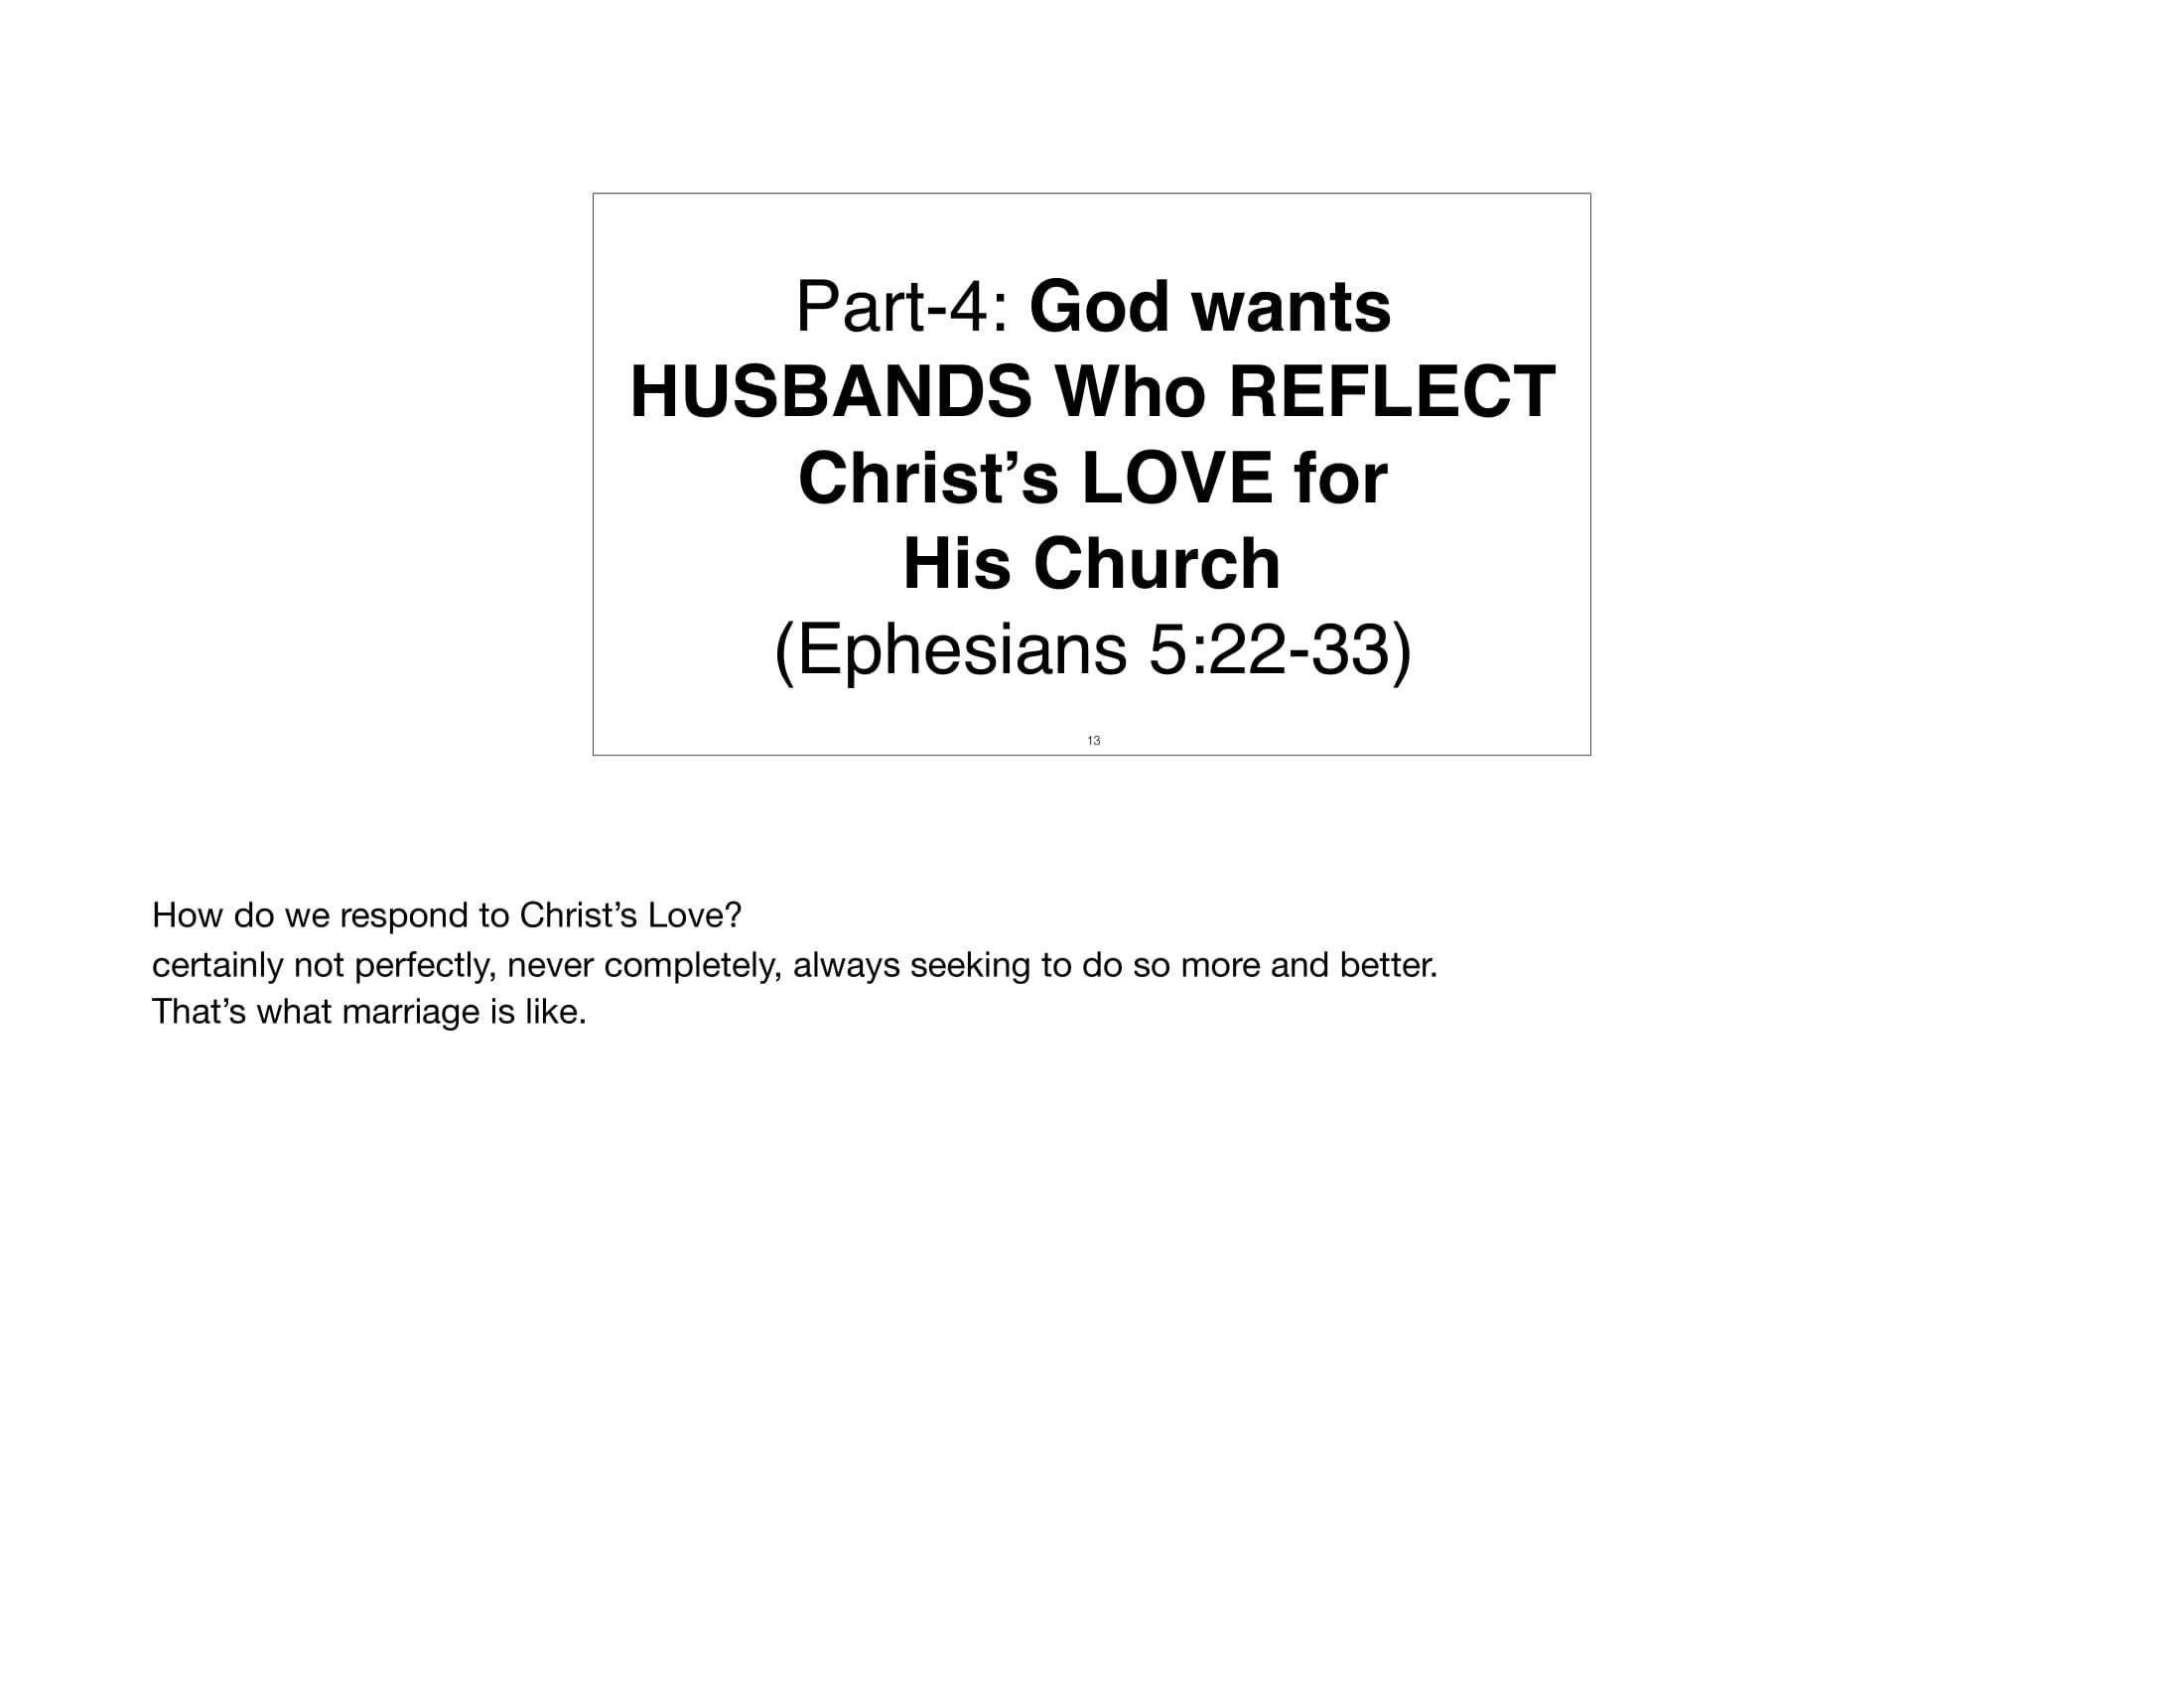 LGI-04 - Caution Men - Spiritual Maturity Is Not Automatic-13